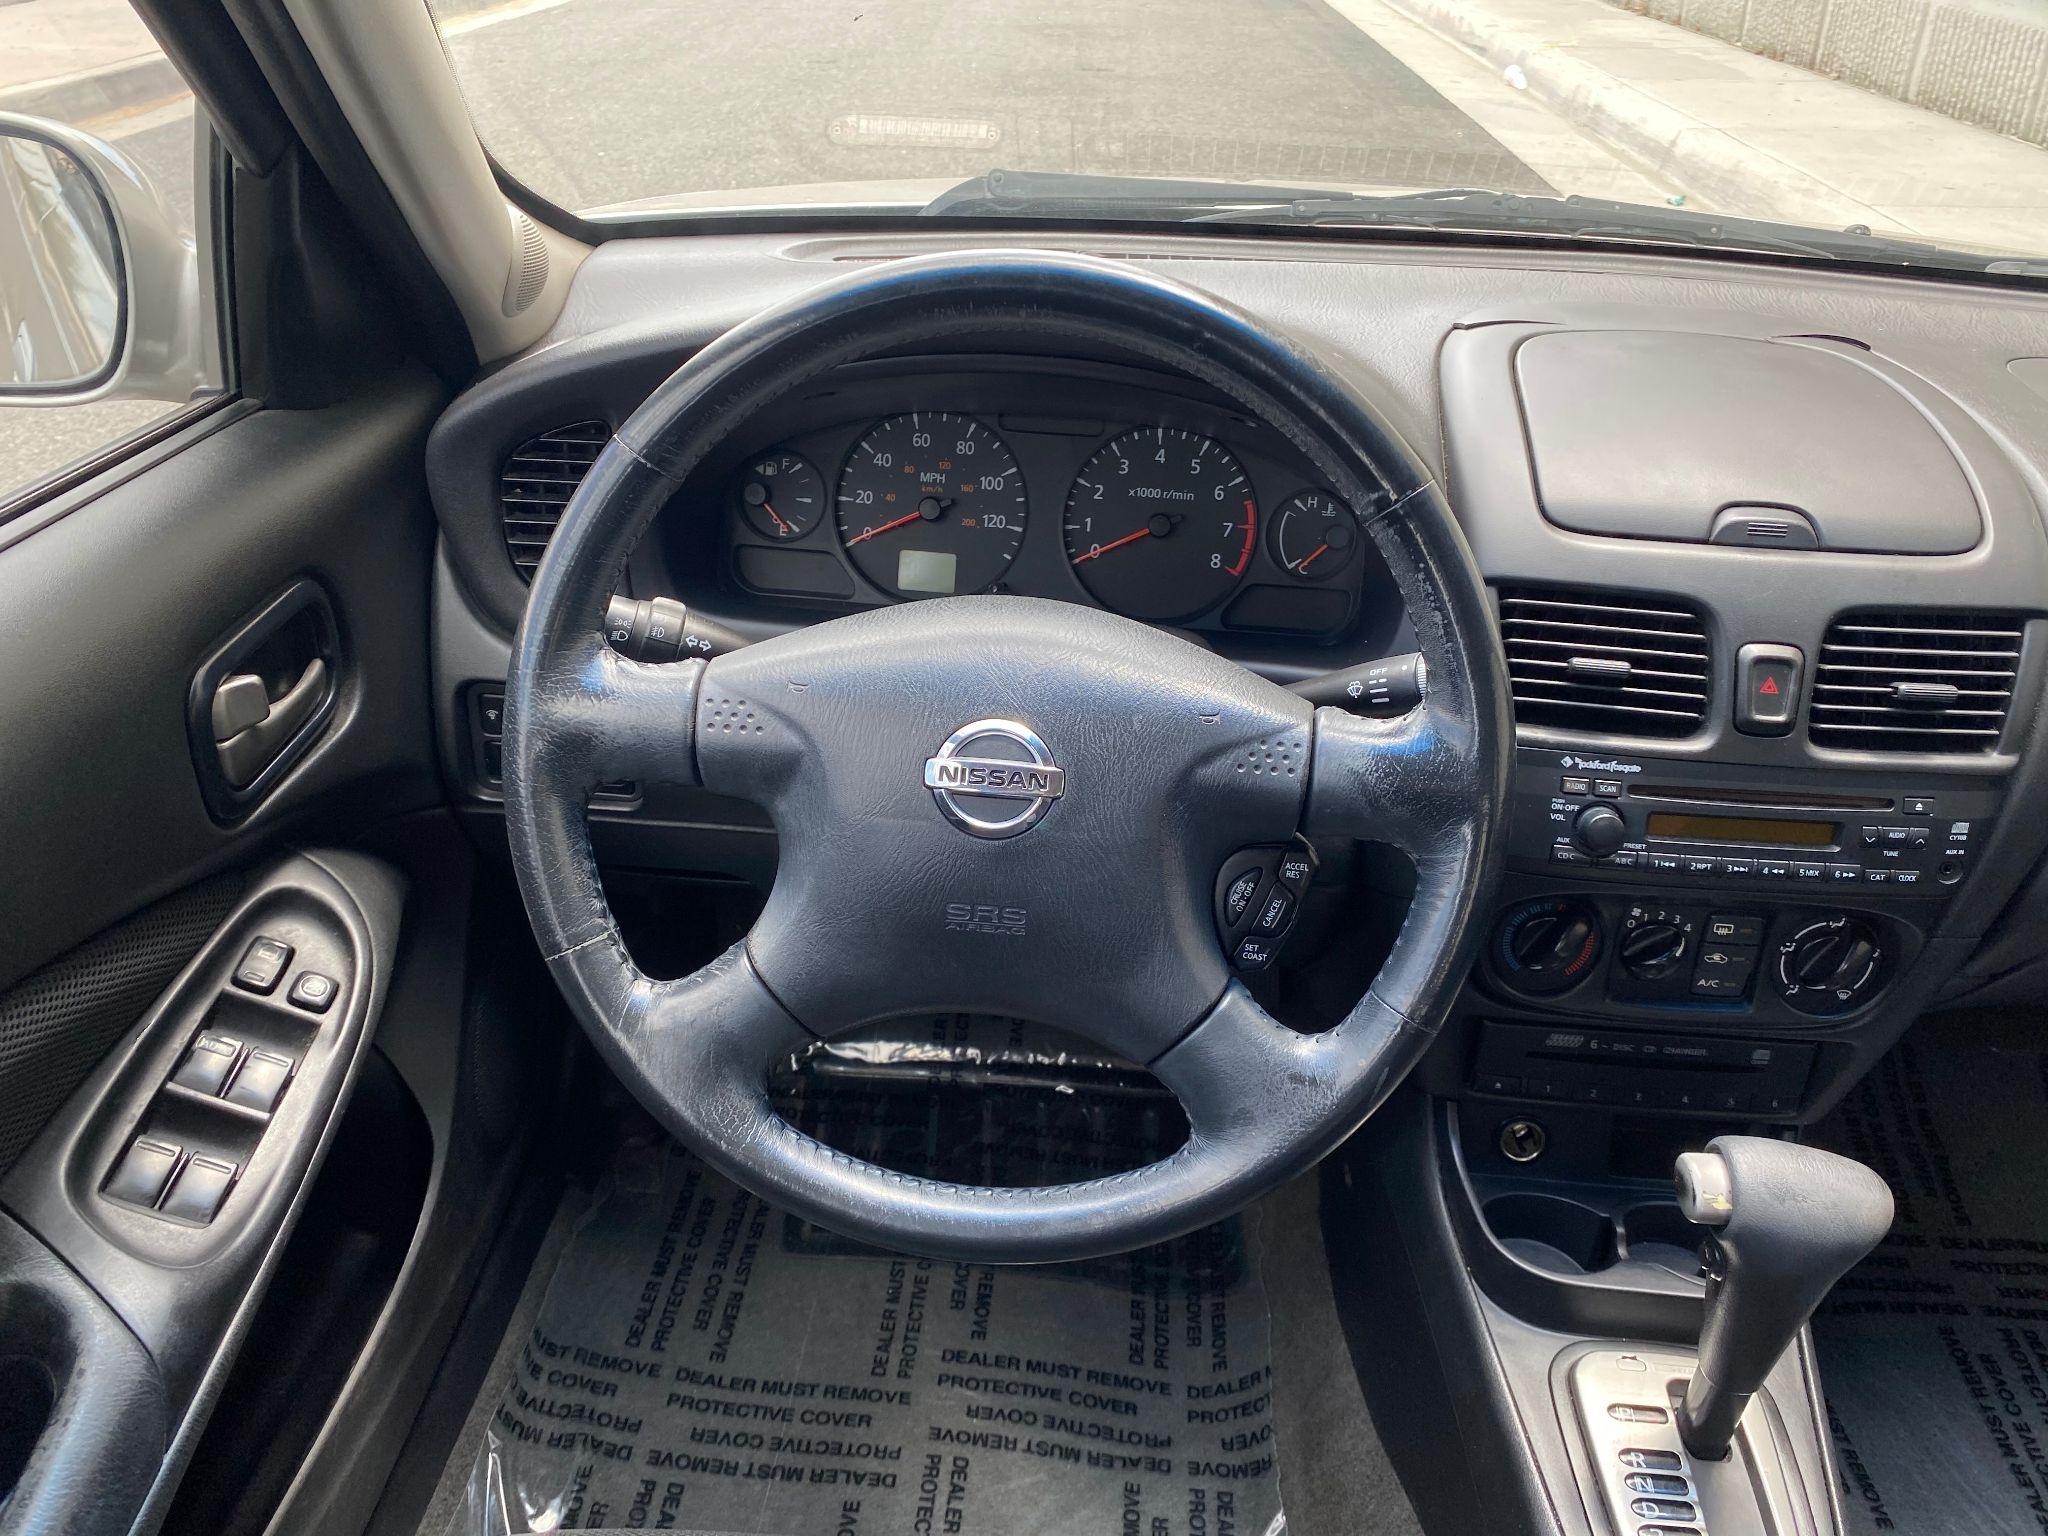 2006 Nissan Sentra 1.8 S